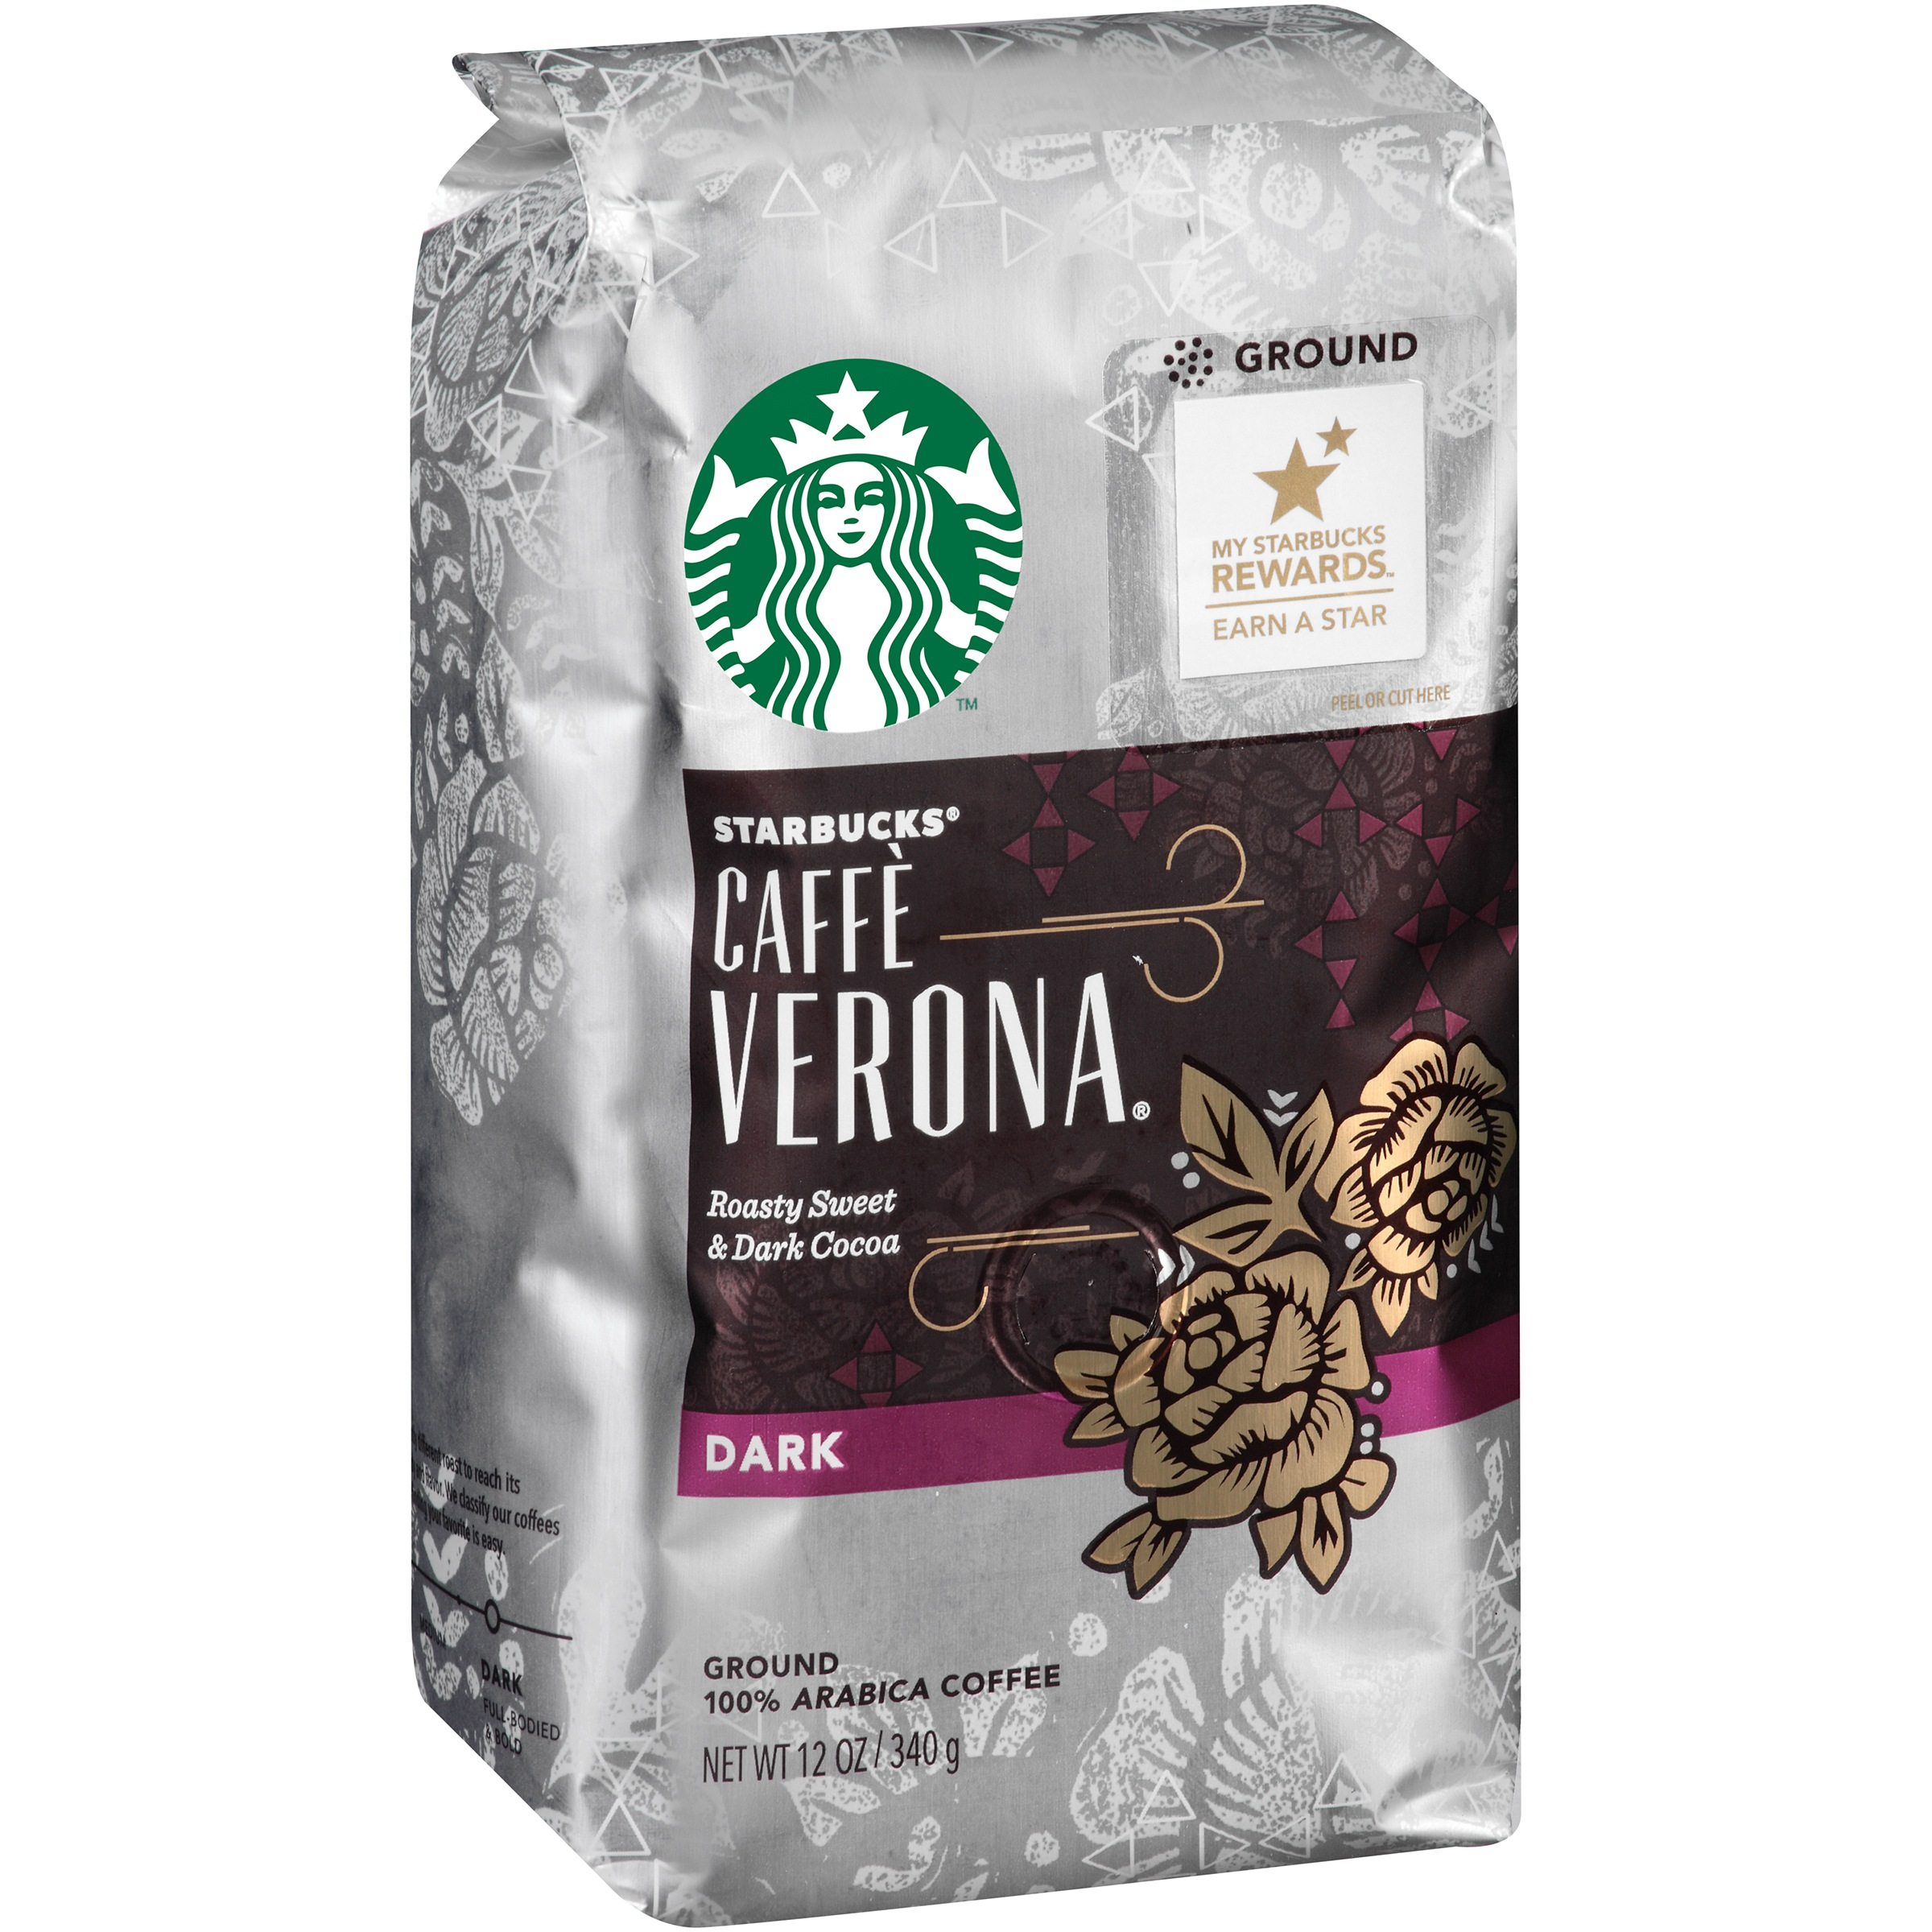 Starbucks 100% Arabica Coffee Caffe Verona Dark Ground, 12.0 OZ